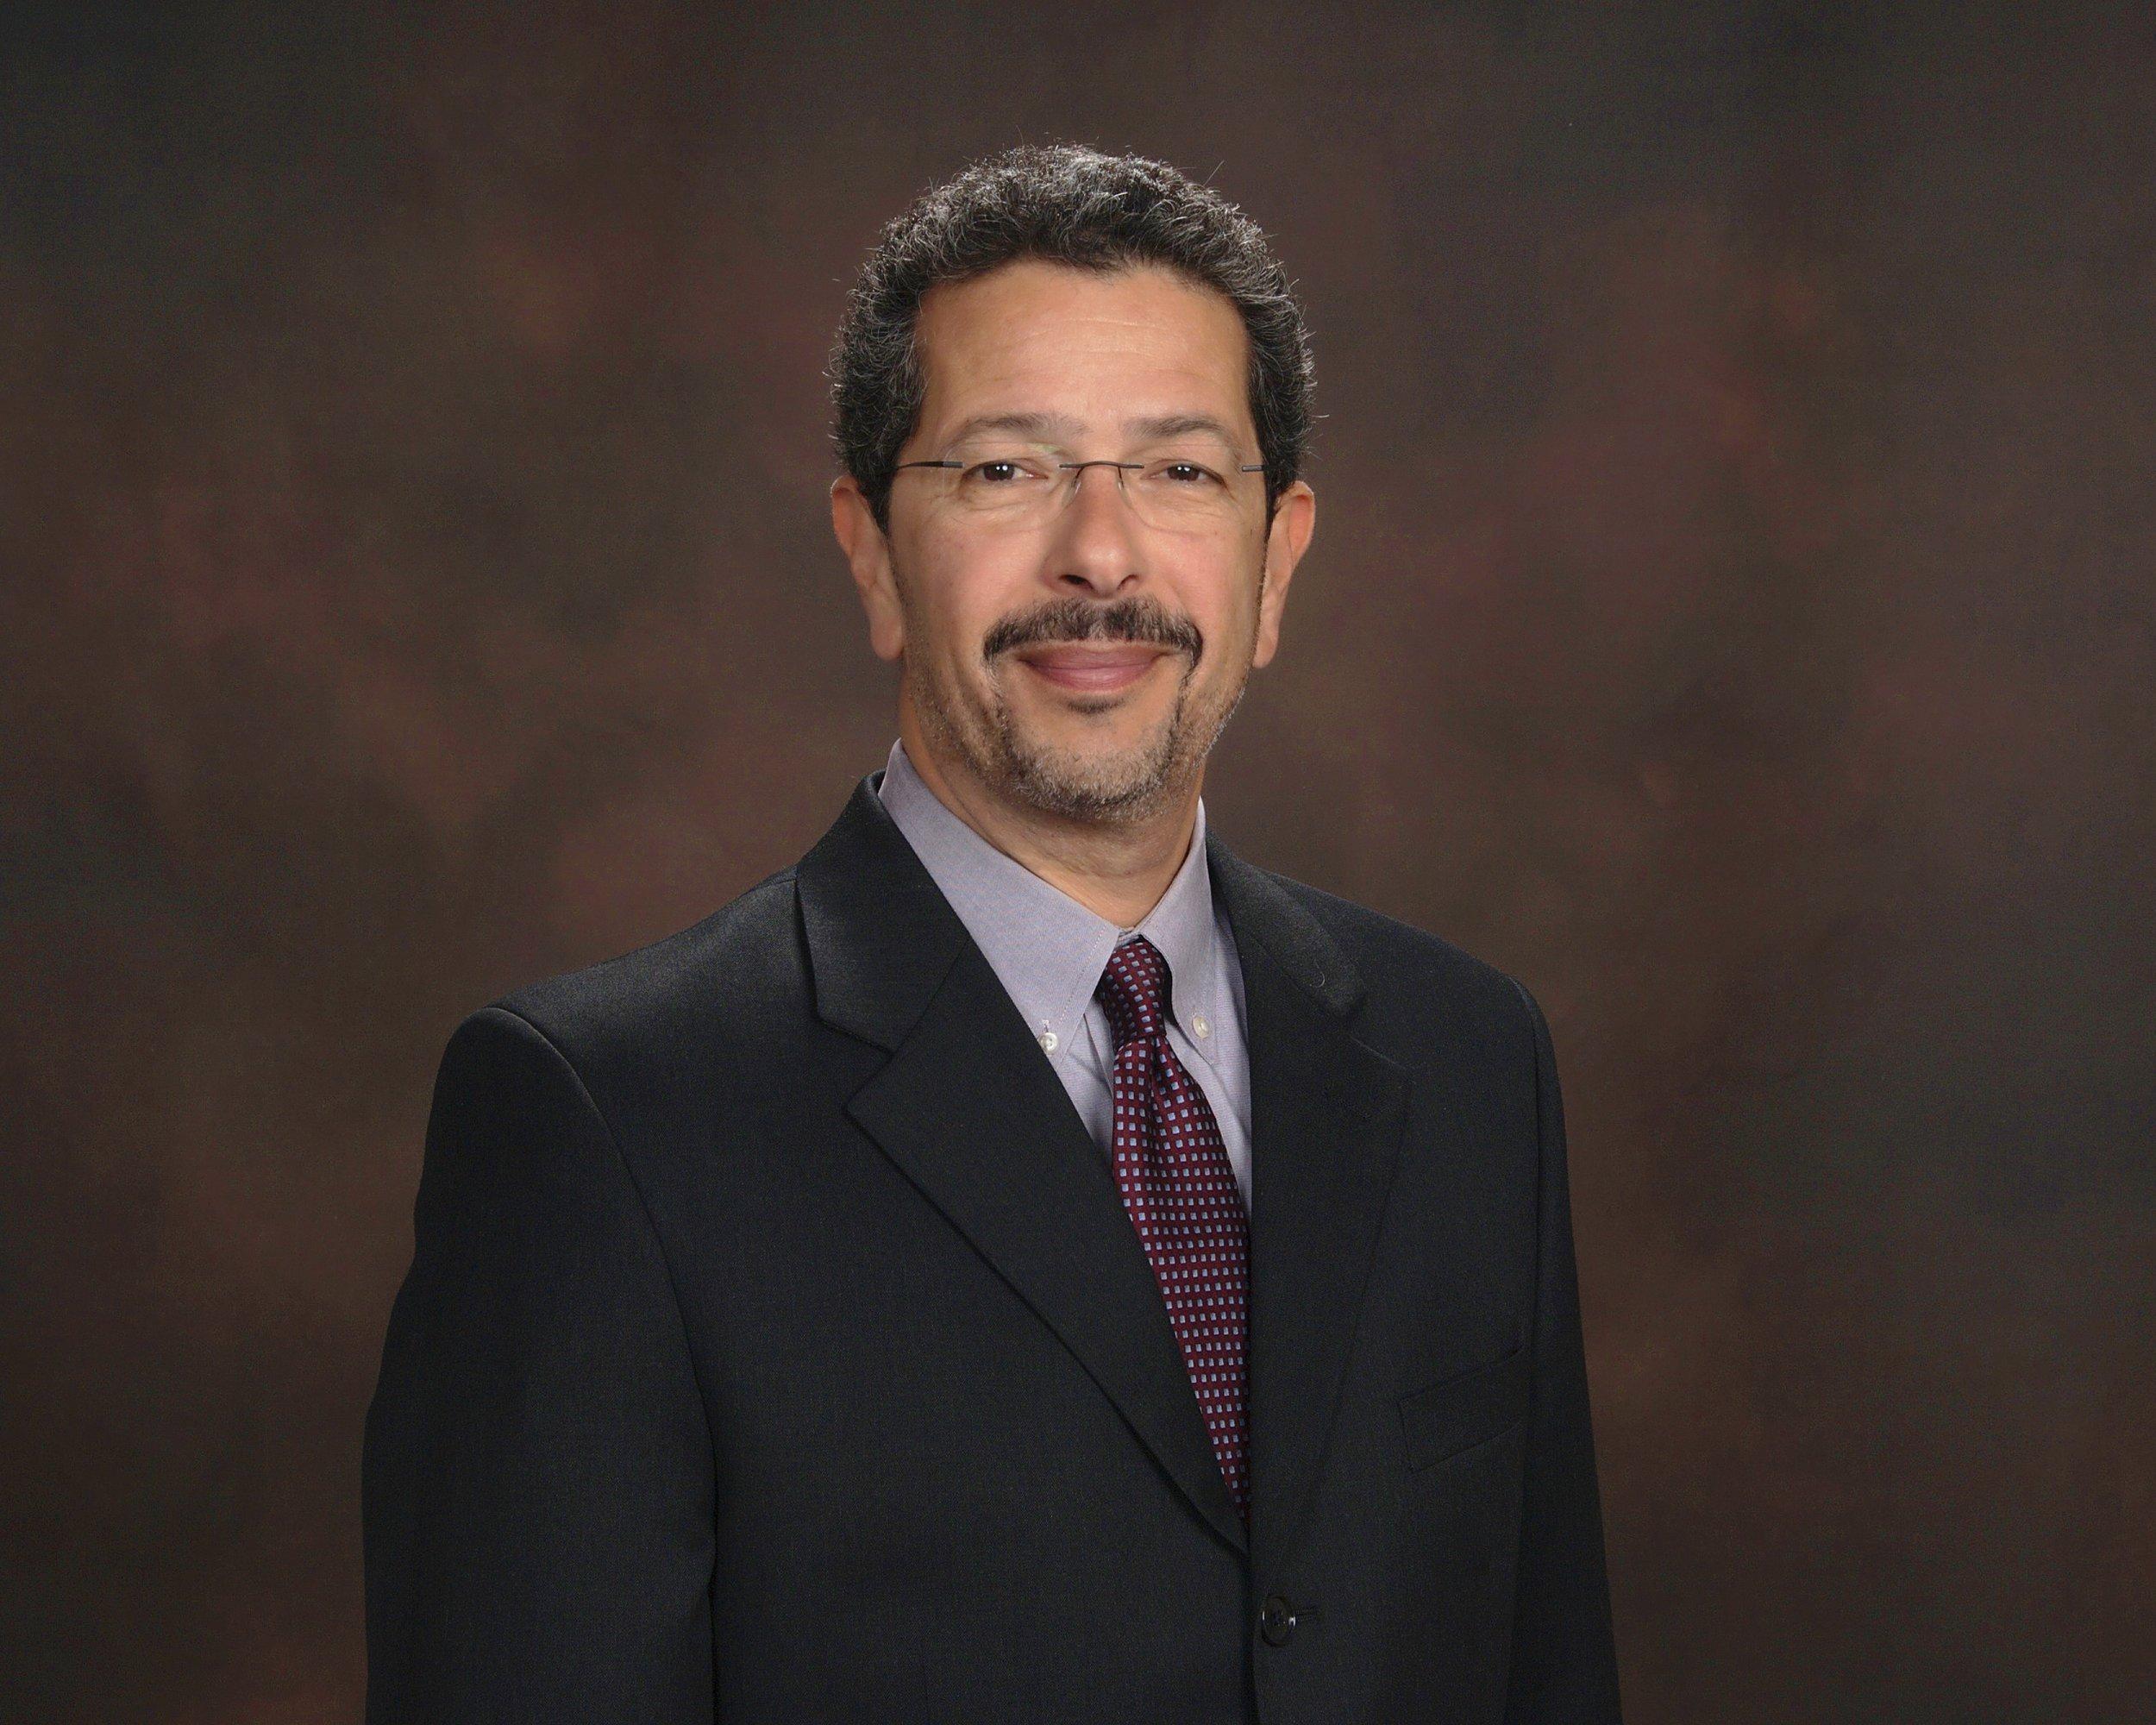 Professor Bob Emiliani